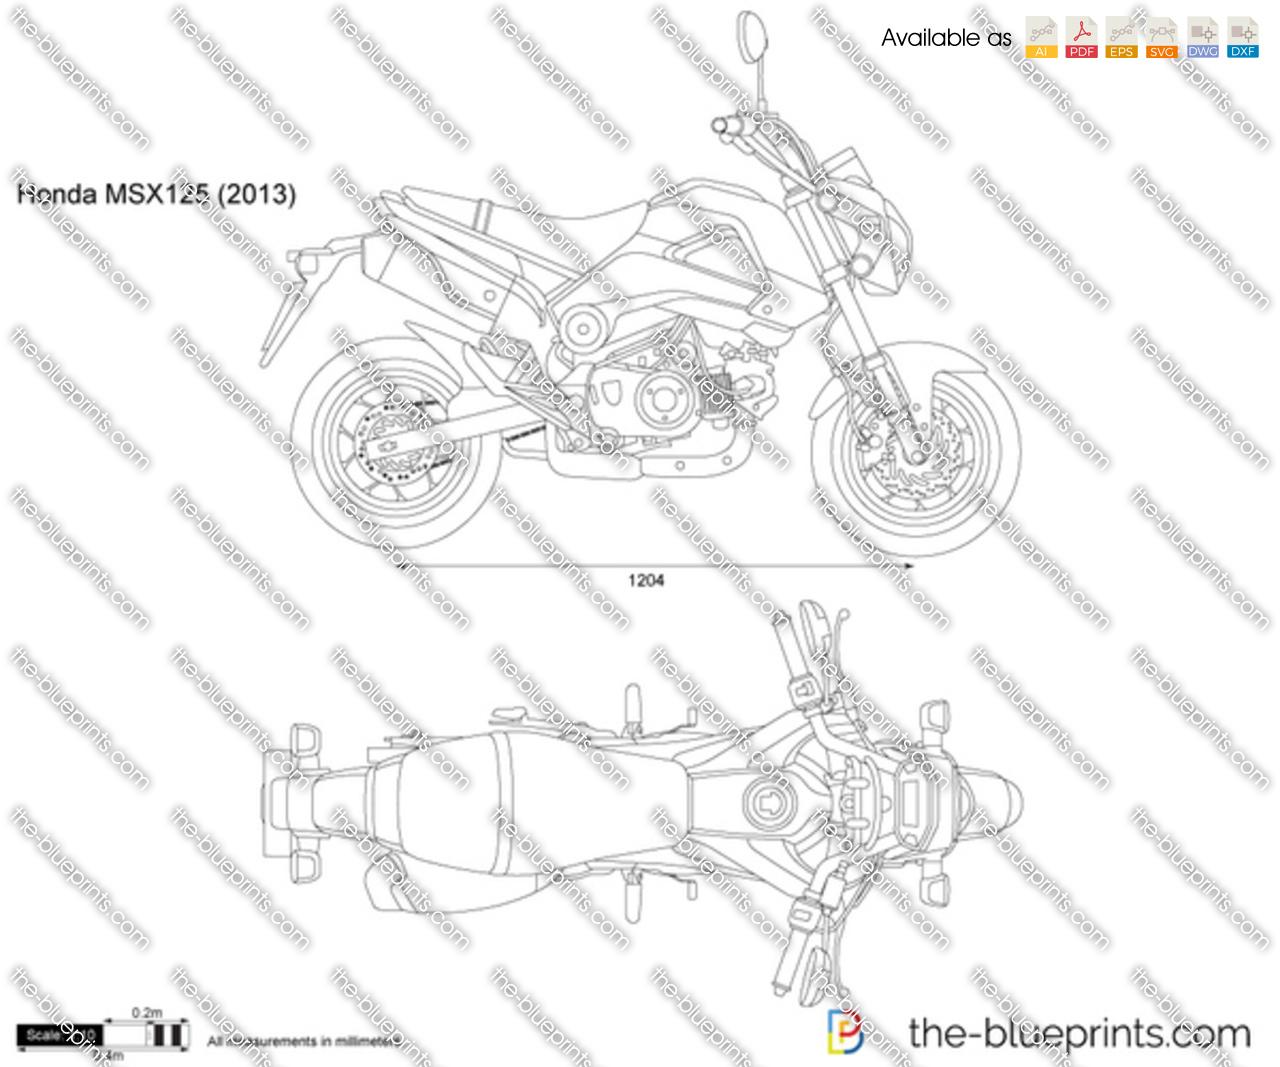 Honda MSX125 2016